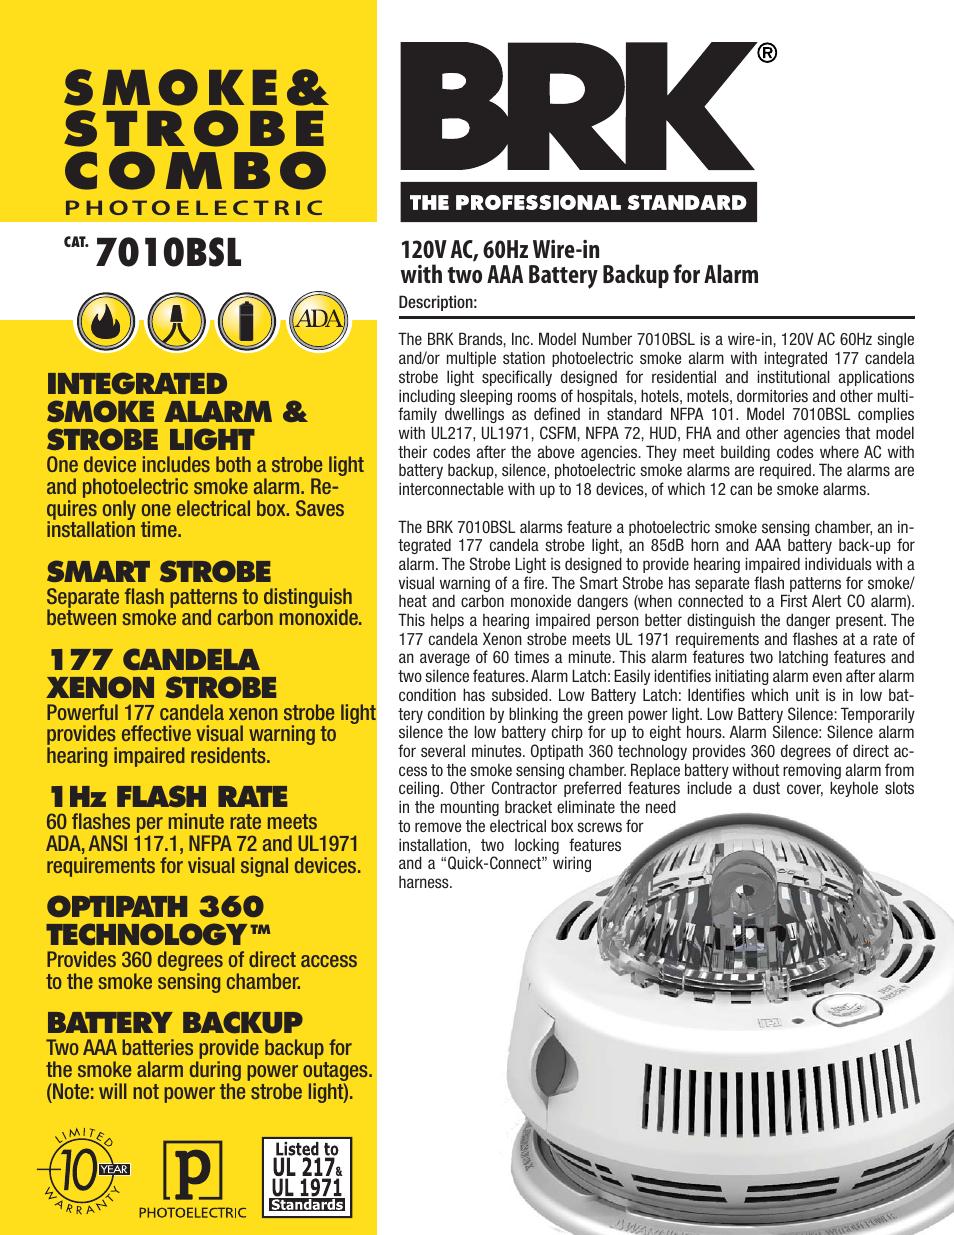 Brk Electronic Integrated Smoke Alarm Strobe Light 7010bsl User